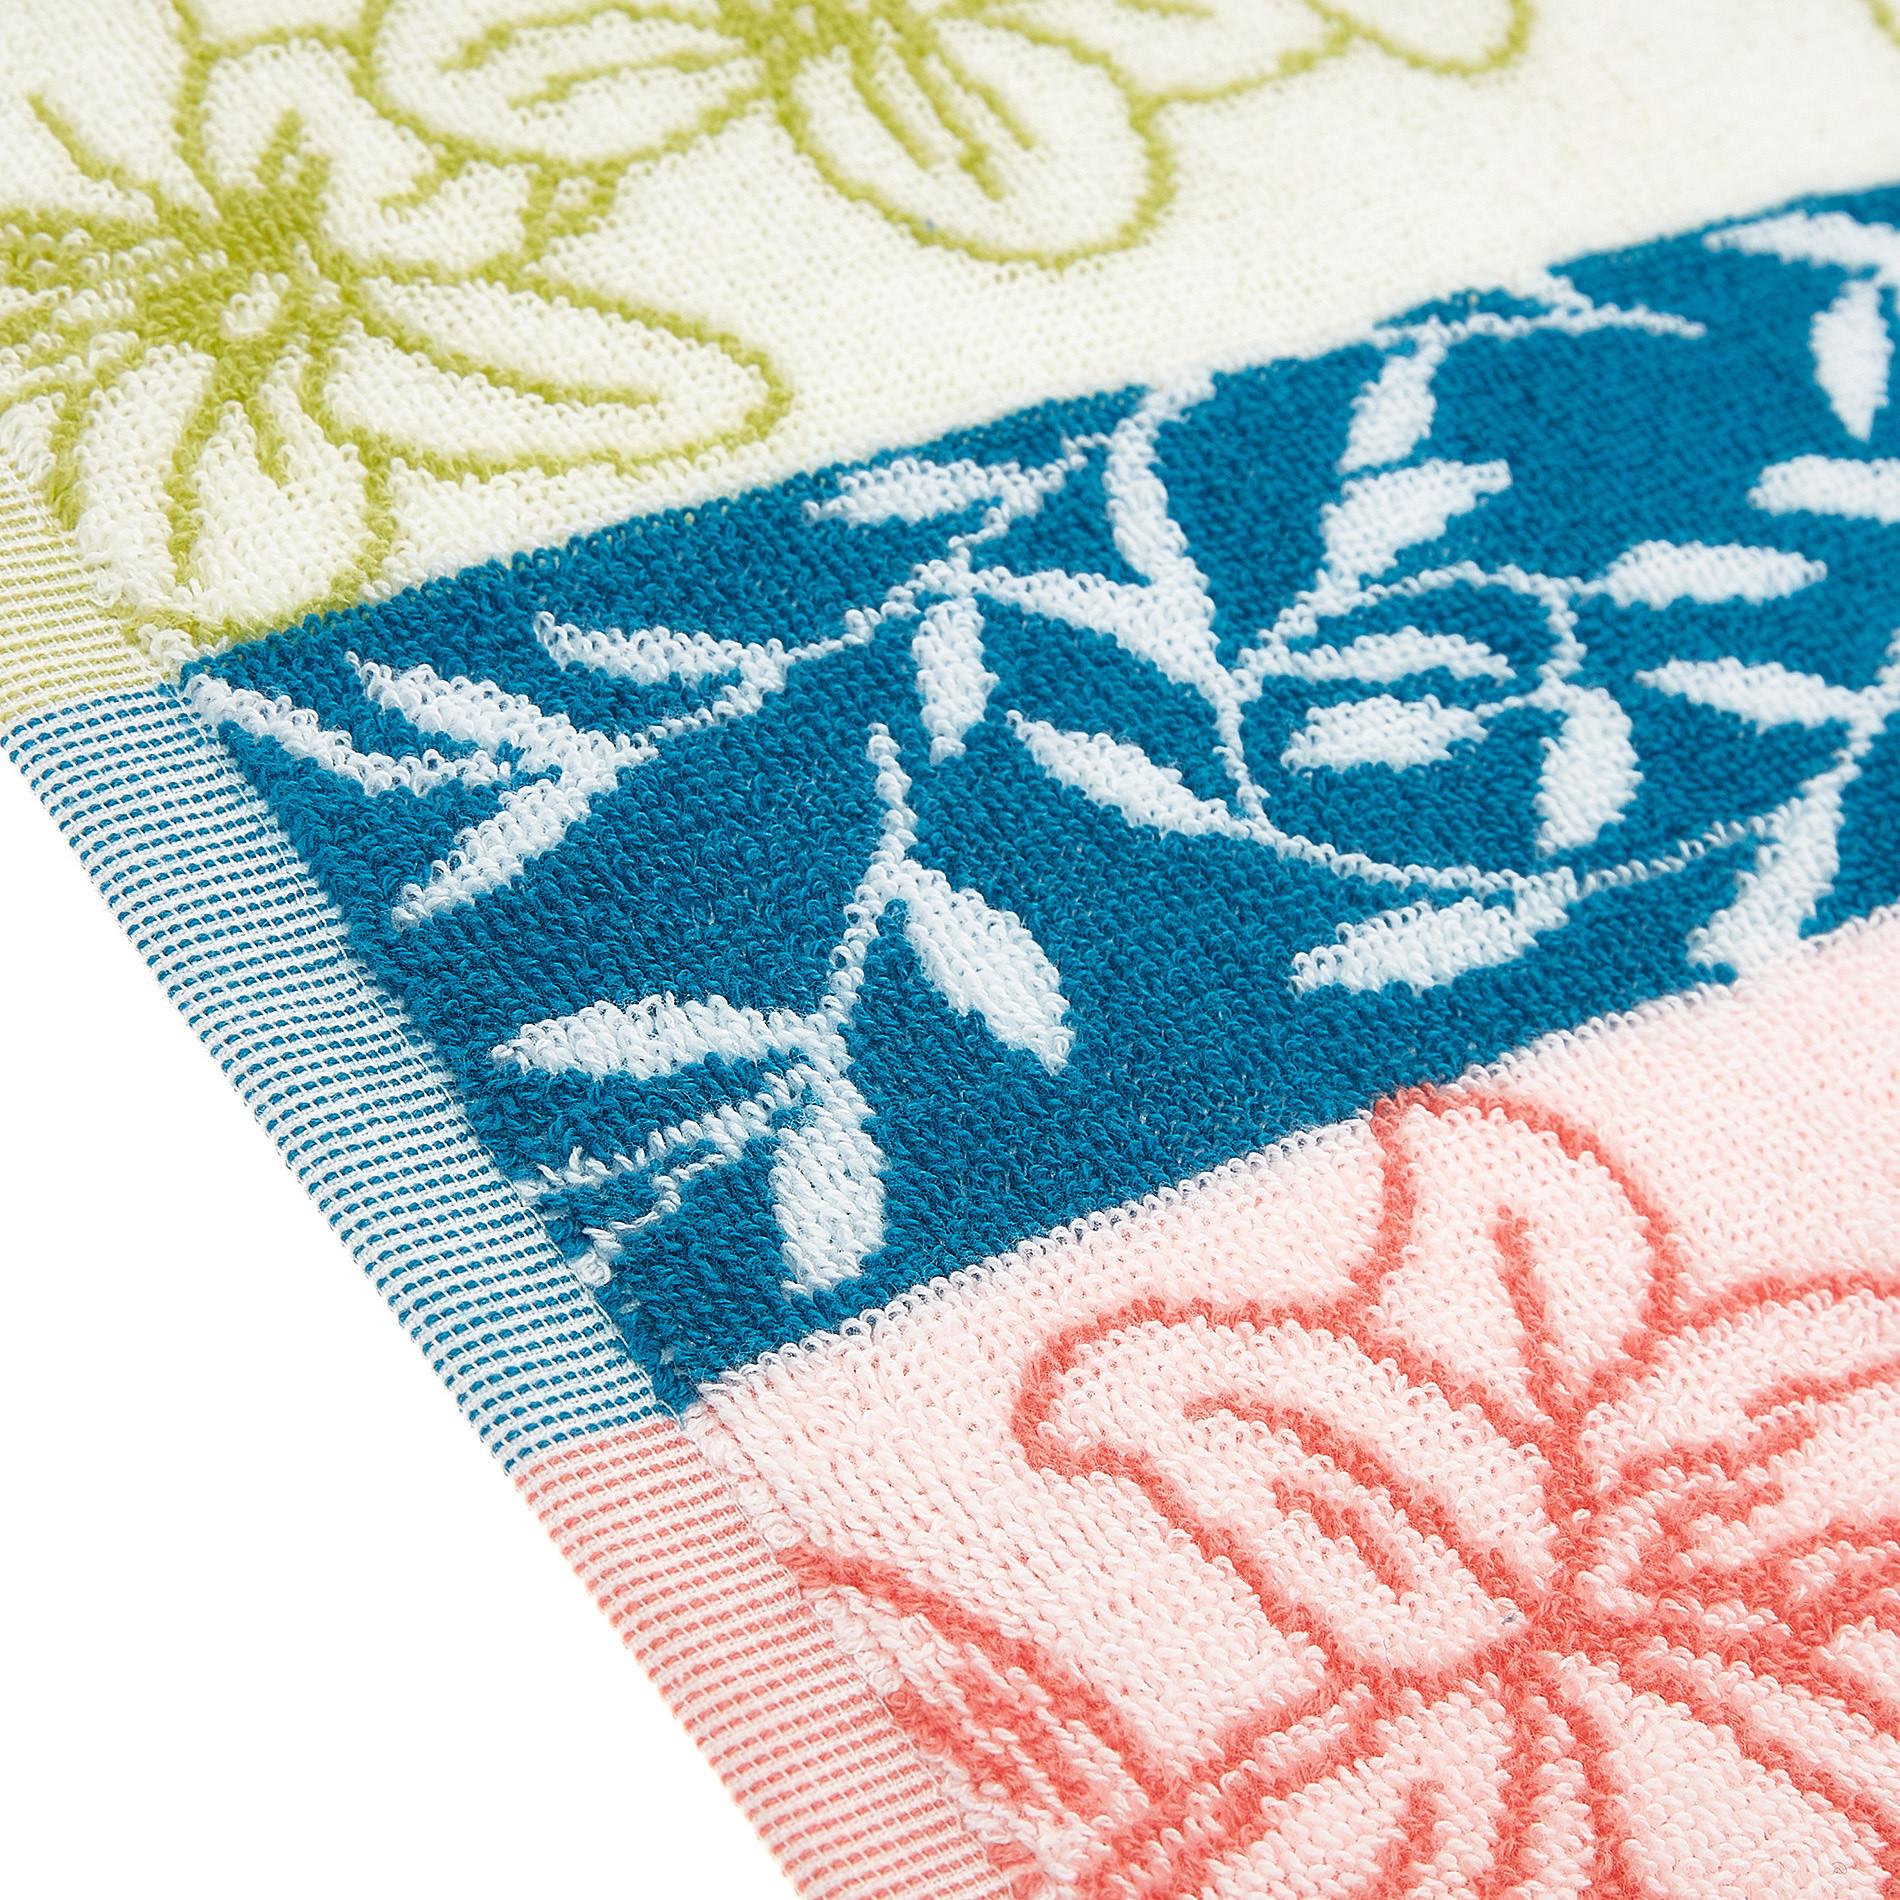 Asciugamano cotone jacquard motivo floreale, Multicolor, large image number 2